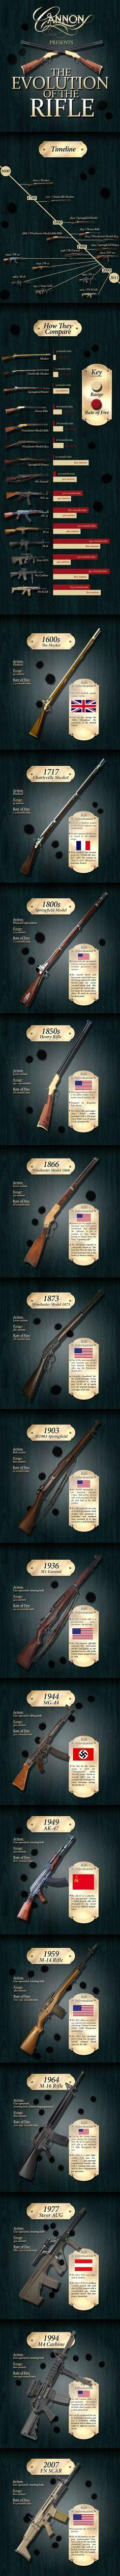 History of rifles